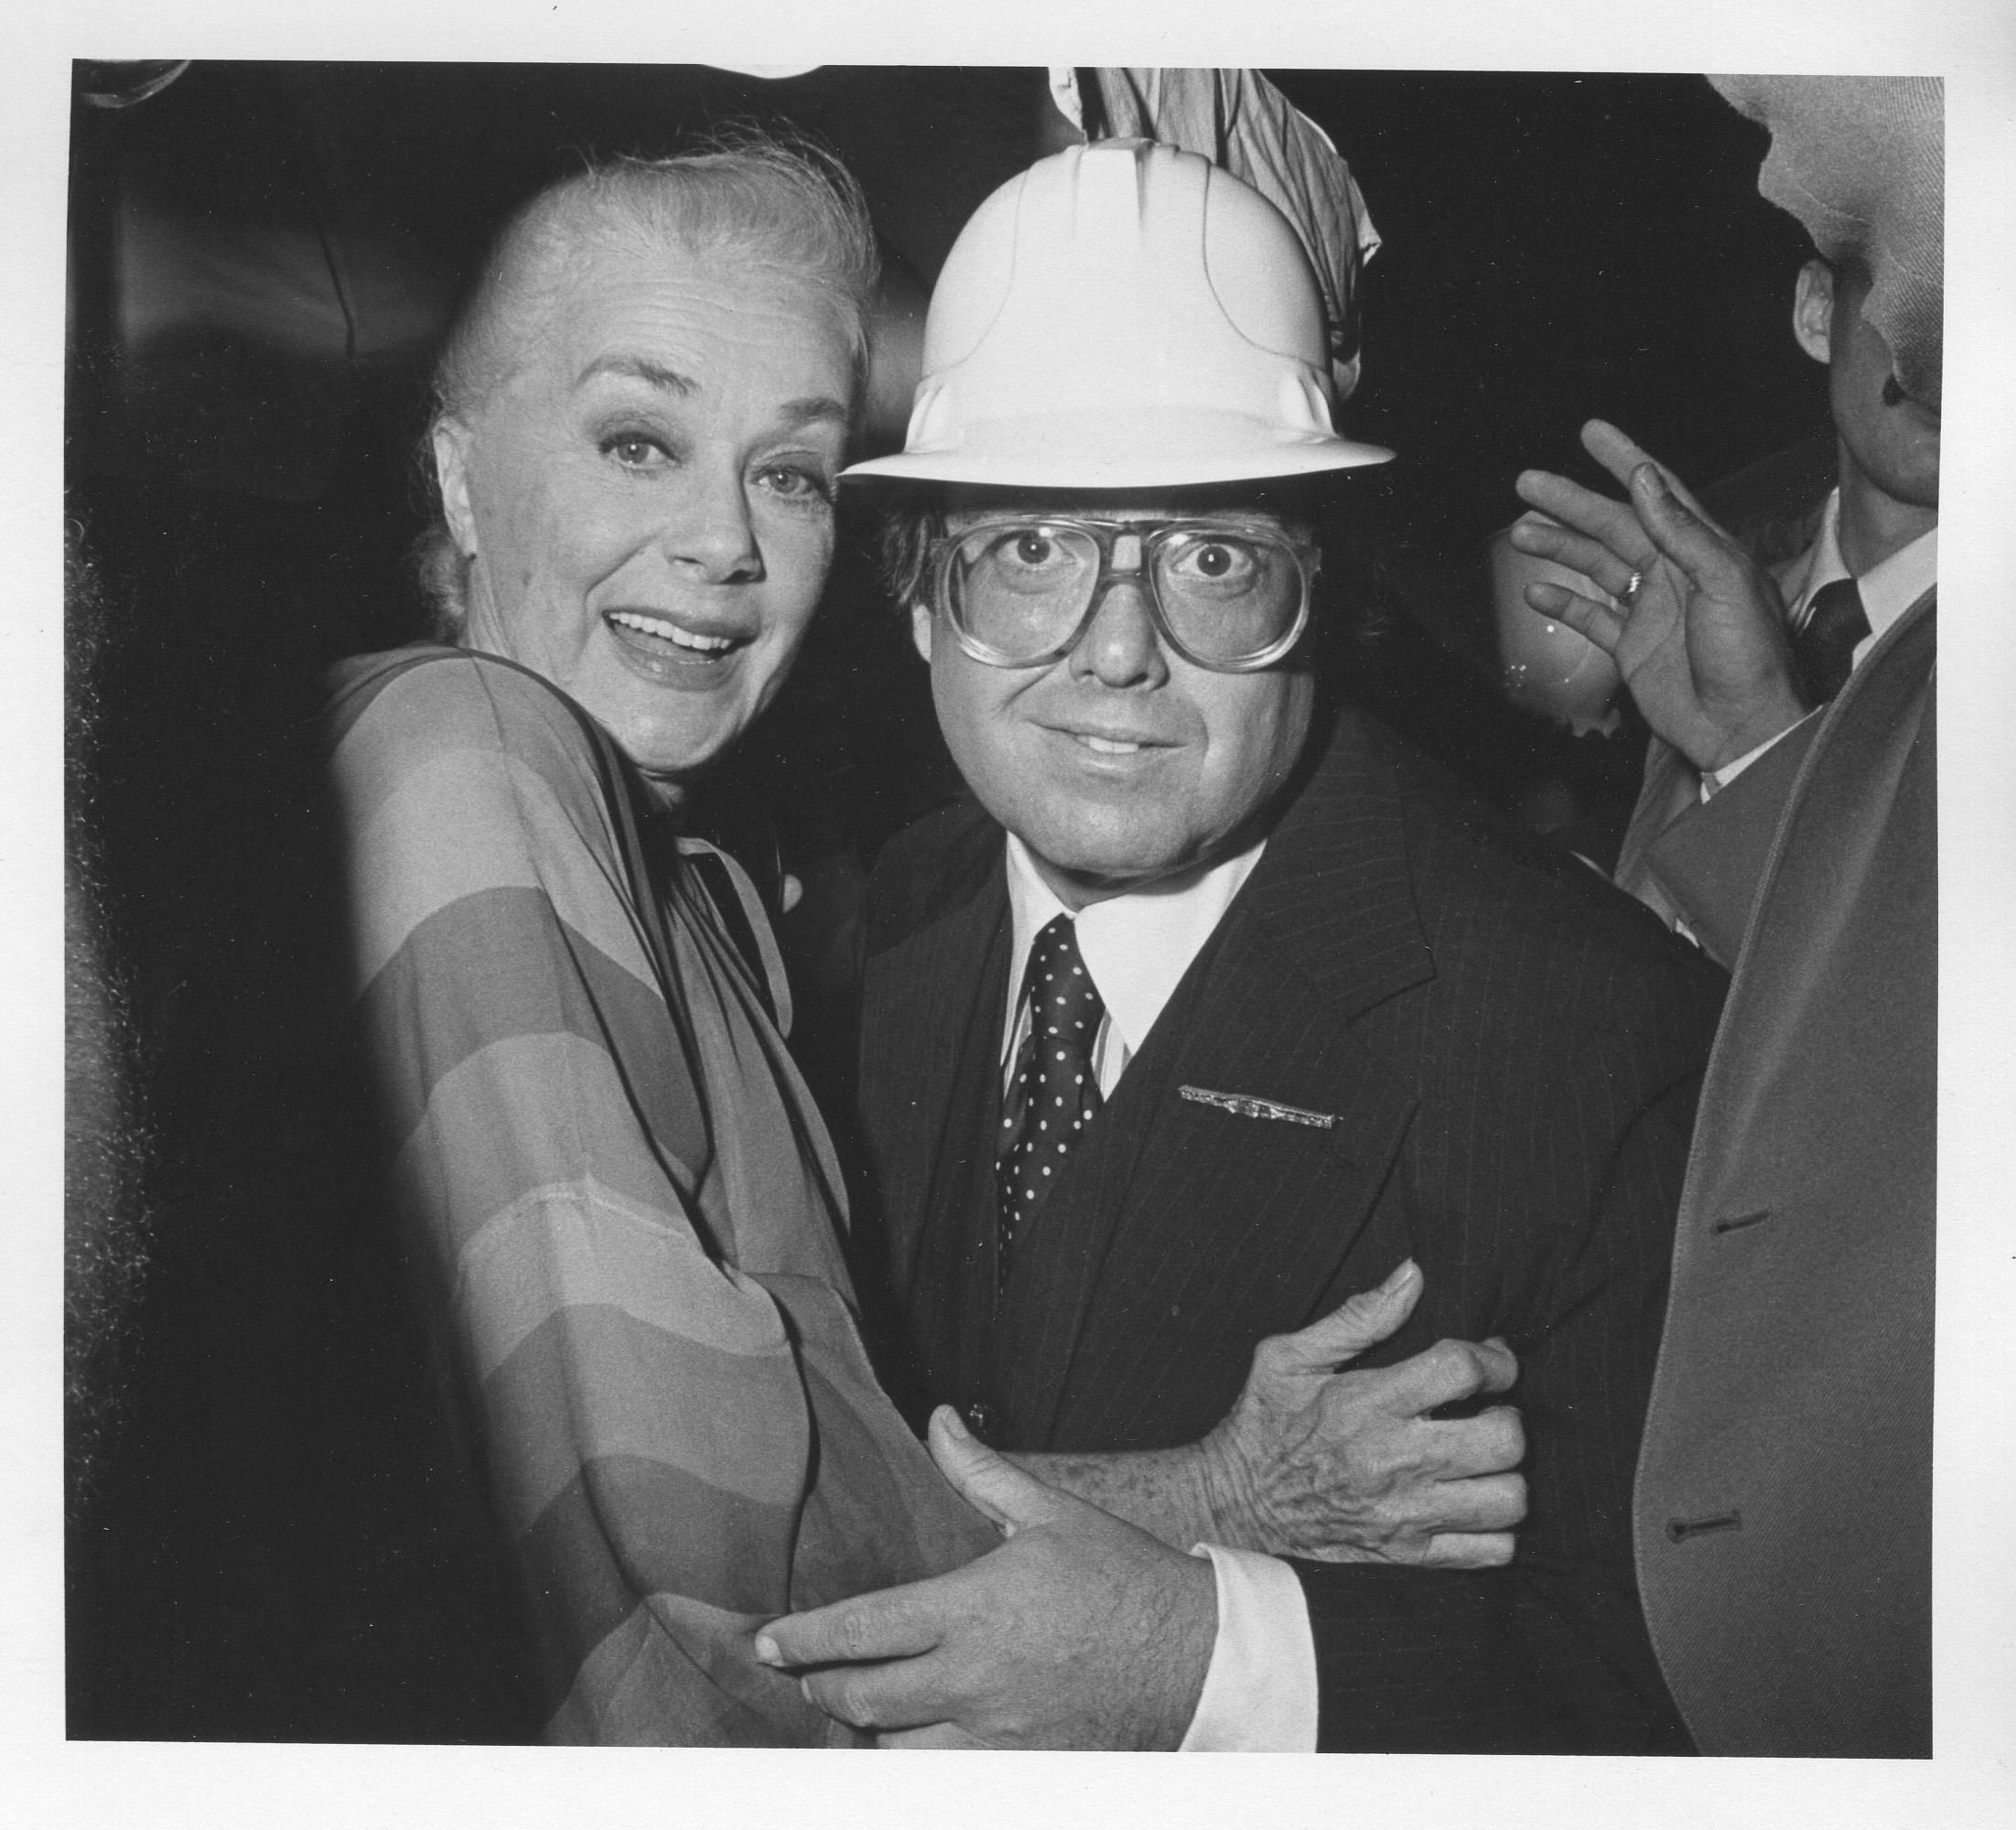 June Havoc & Allan Carr 1980